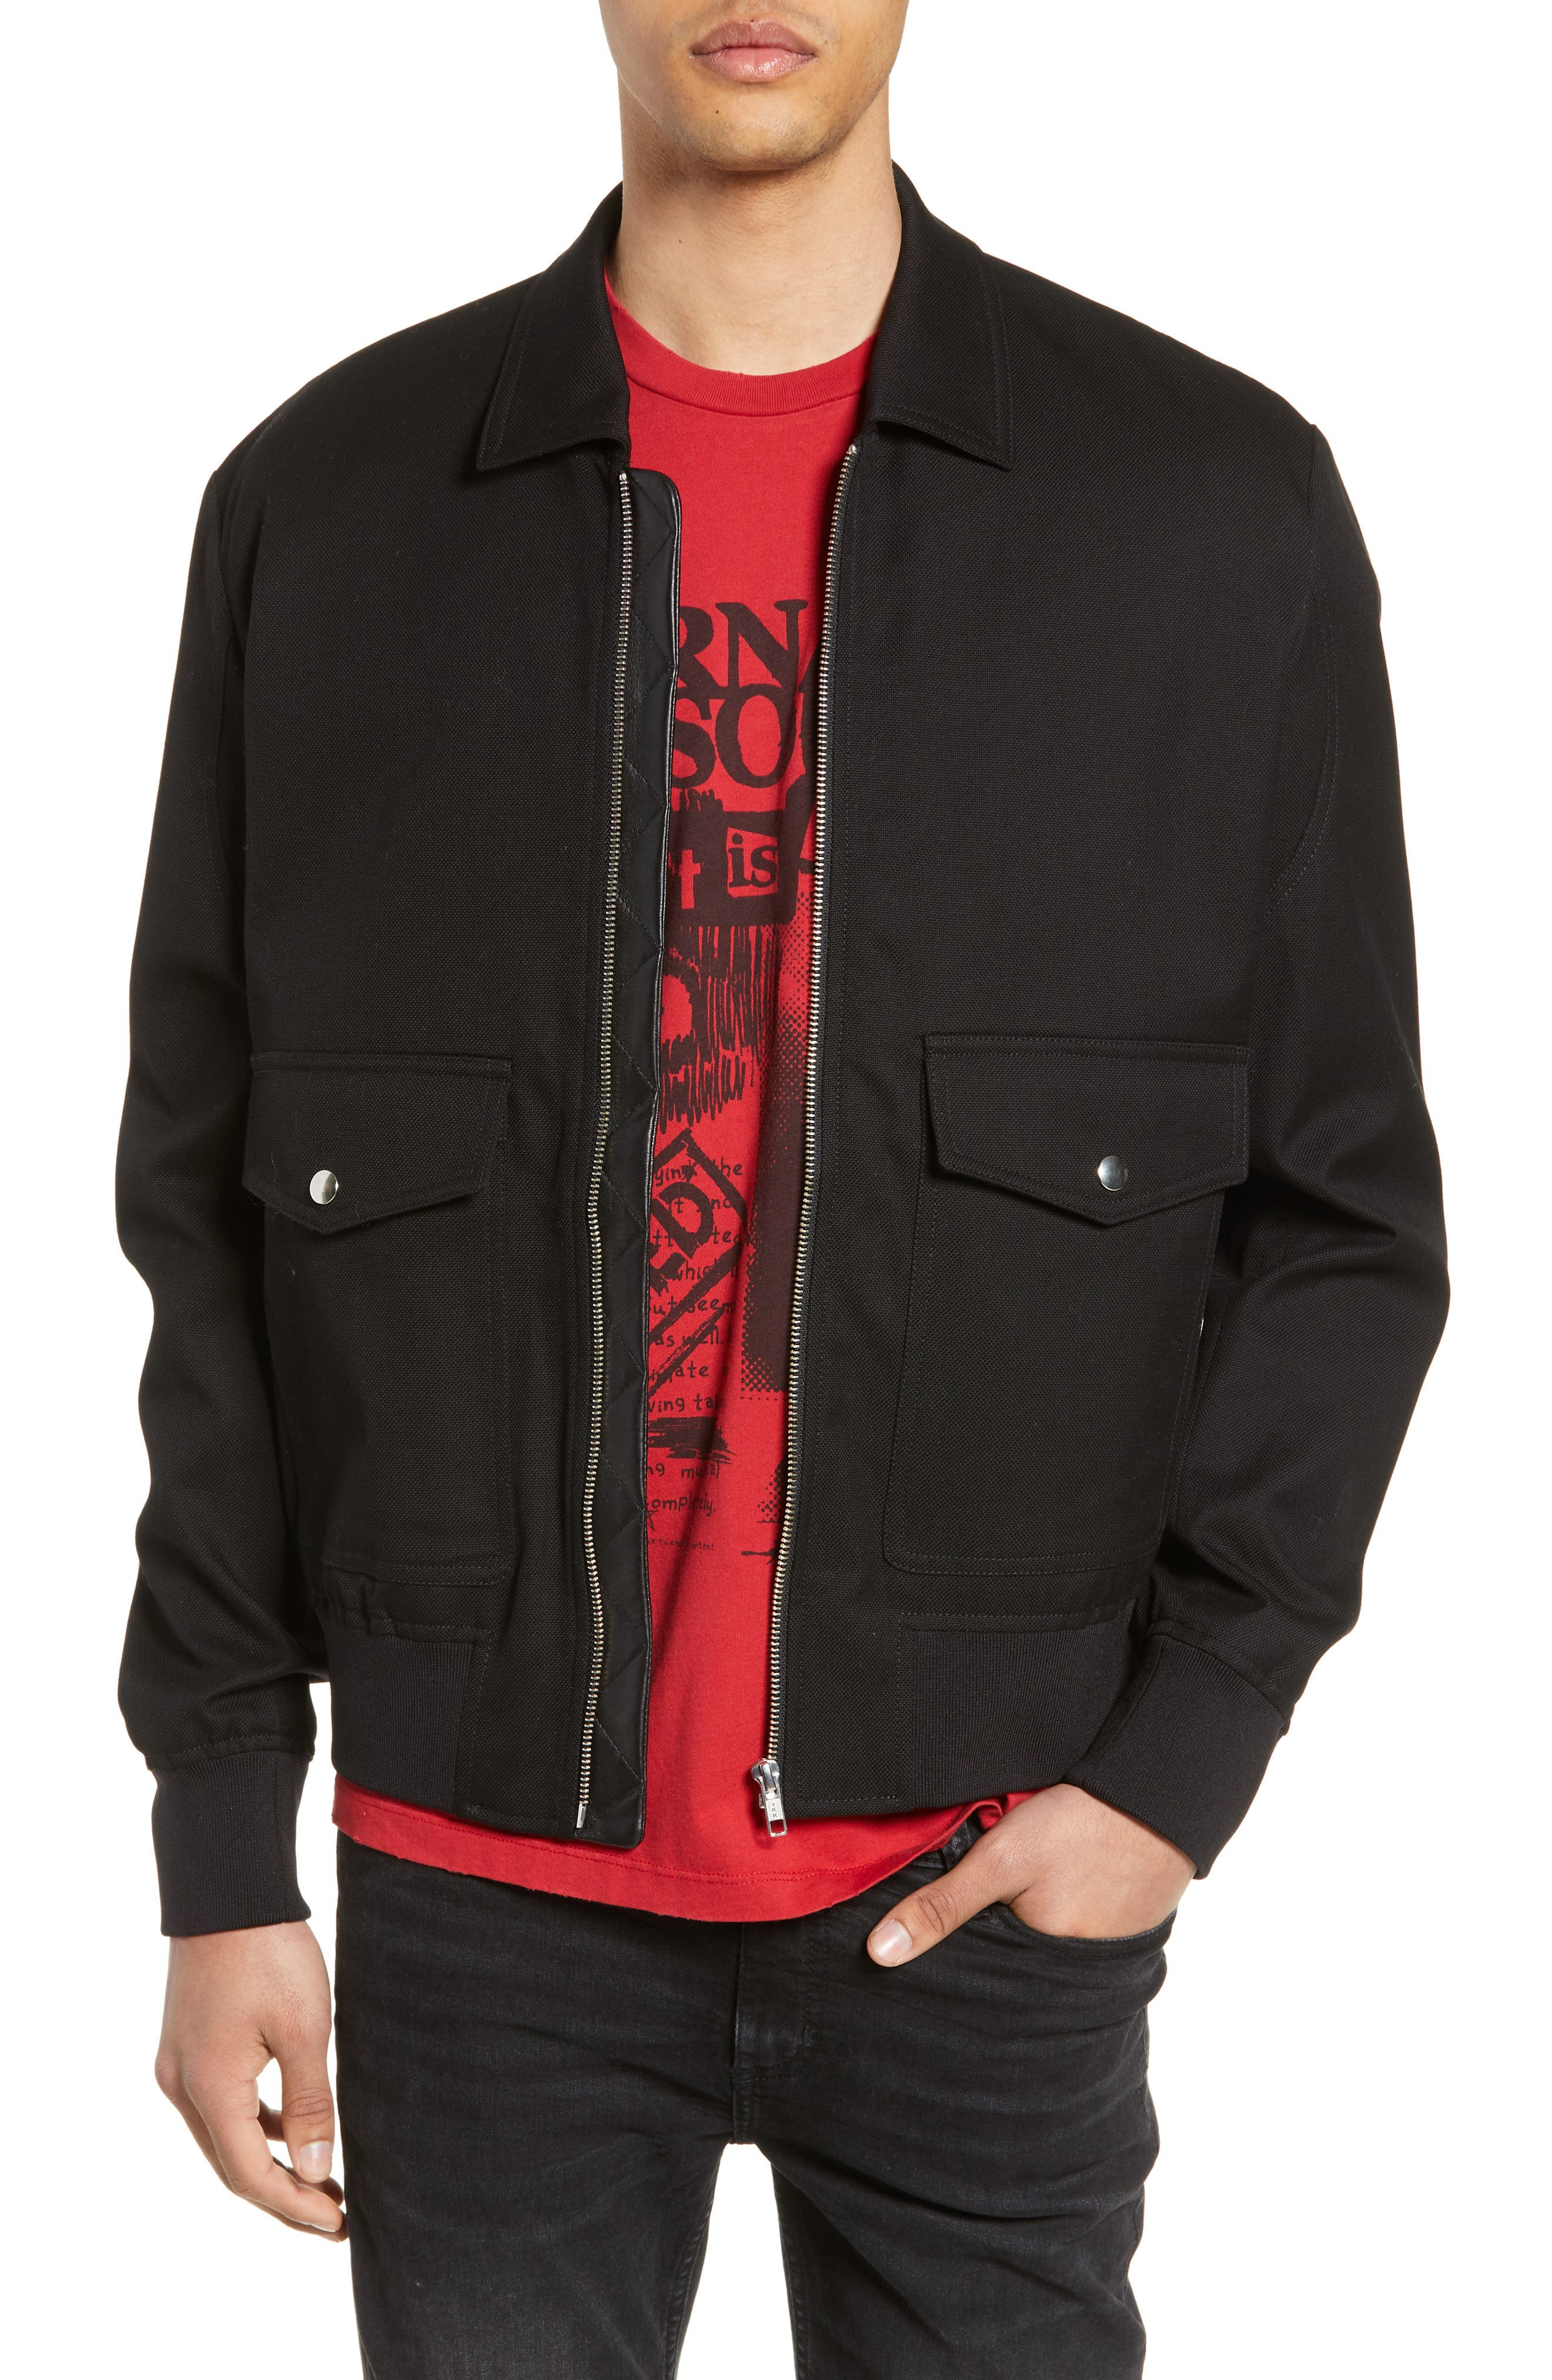 THE KOOPLES, Leather Detail Jacket, Main thumbnail 1, color, BLACK